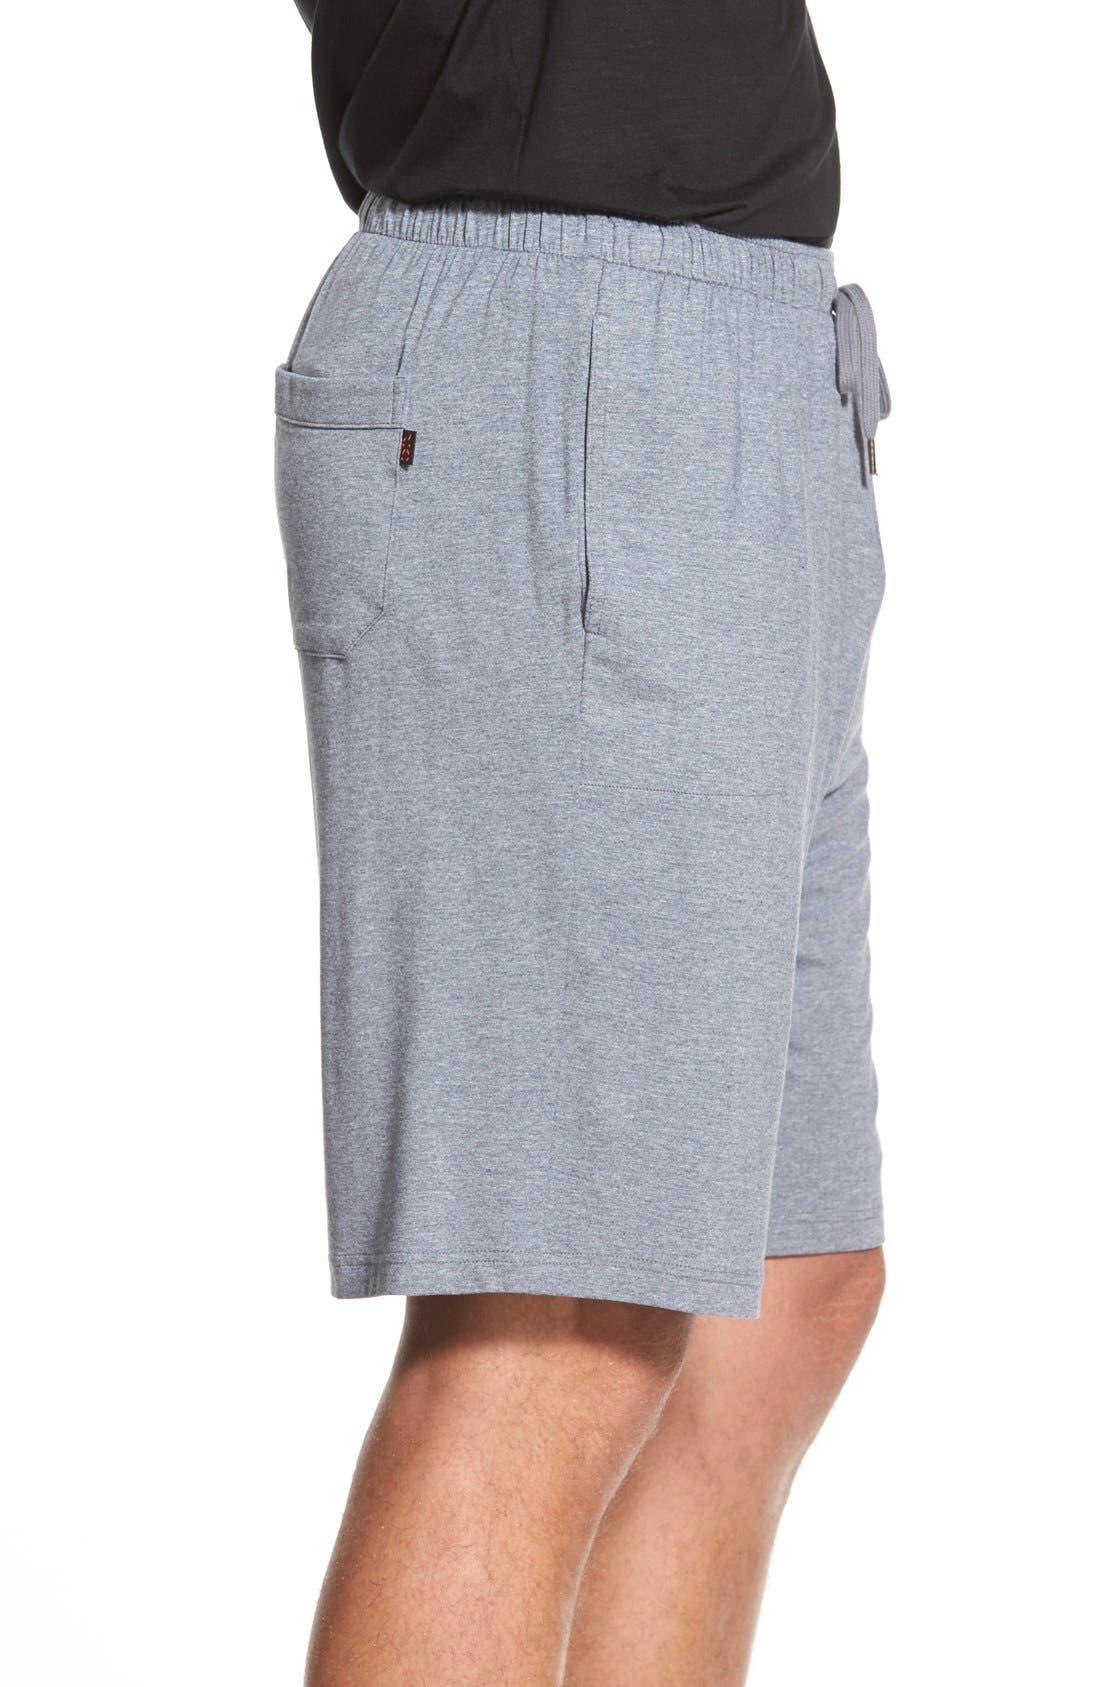 Alternate Image 3  - Derek Rose 'Marlowe' Stretch Modal Lounge Shorts